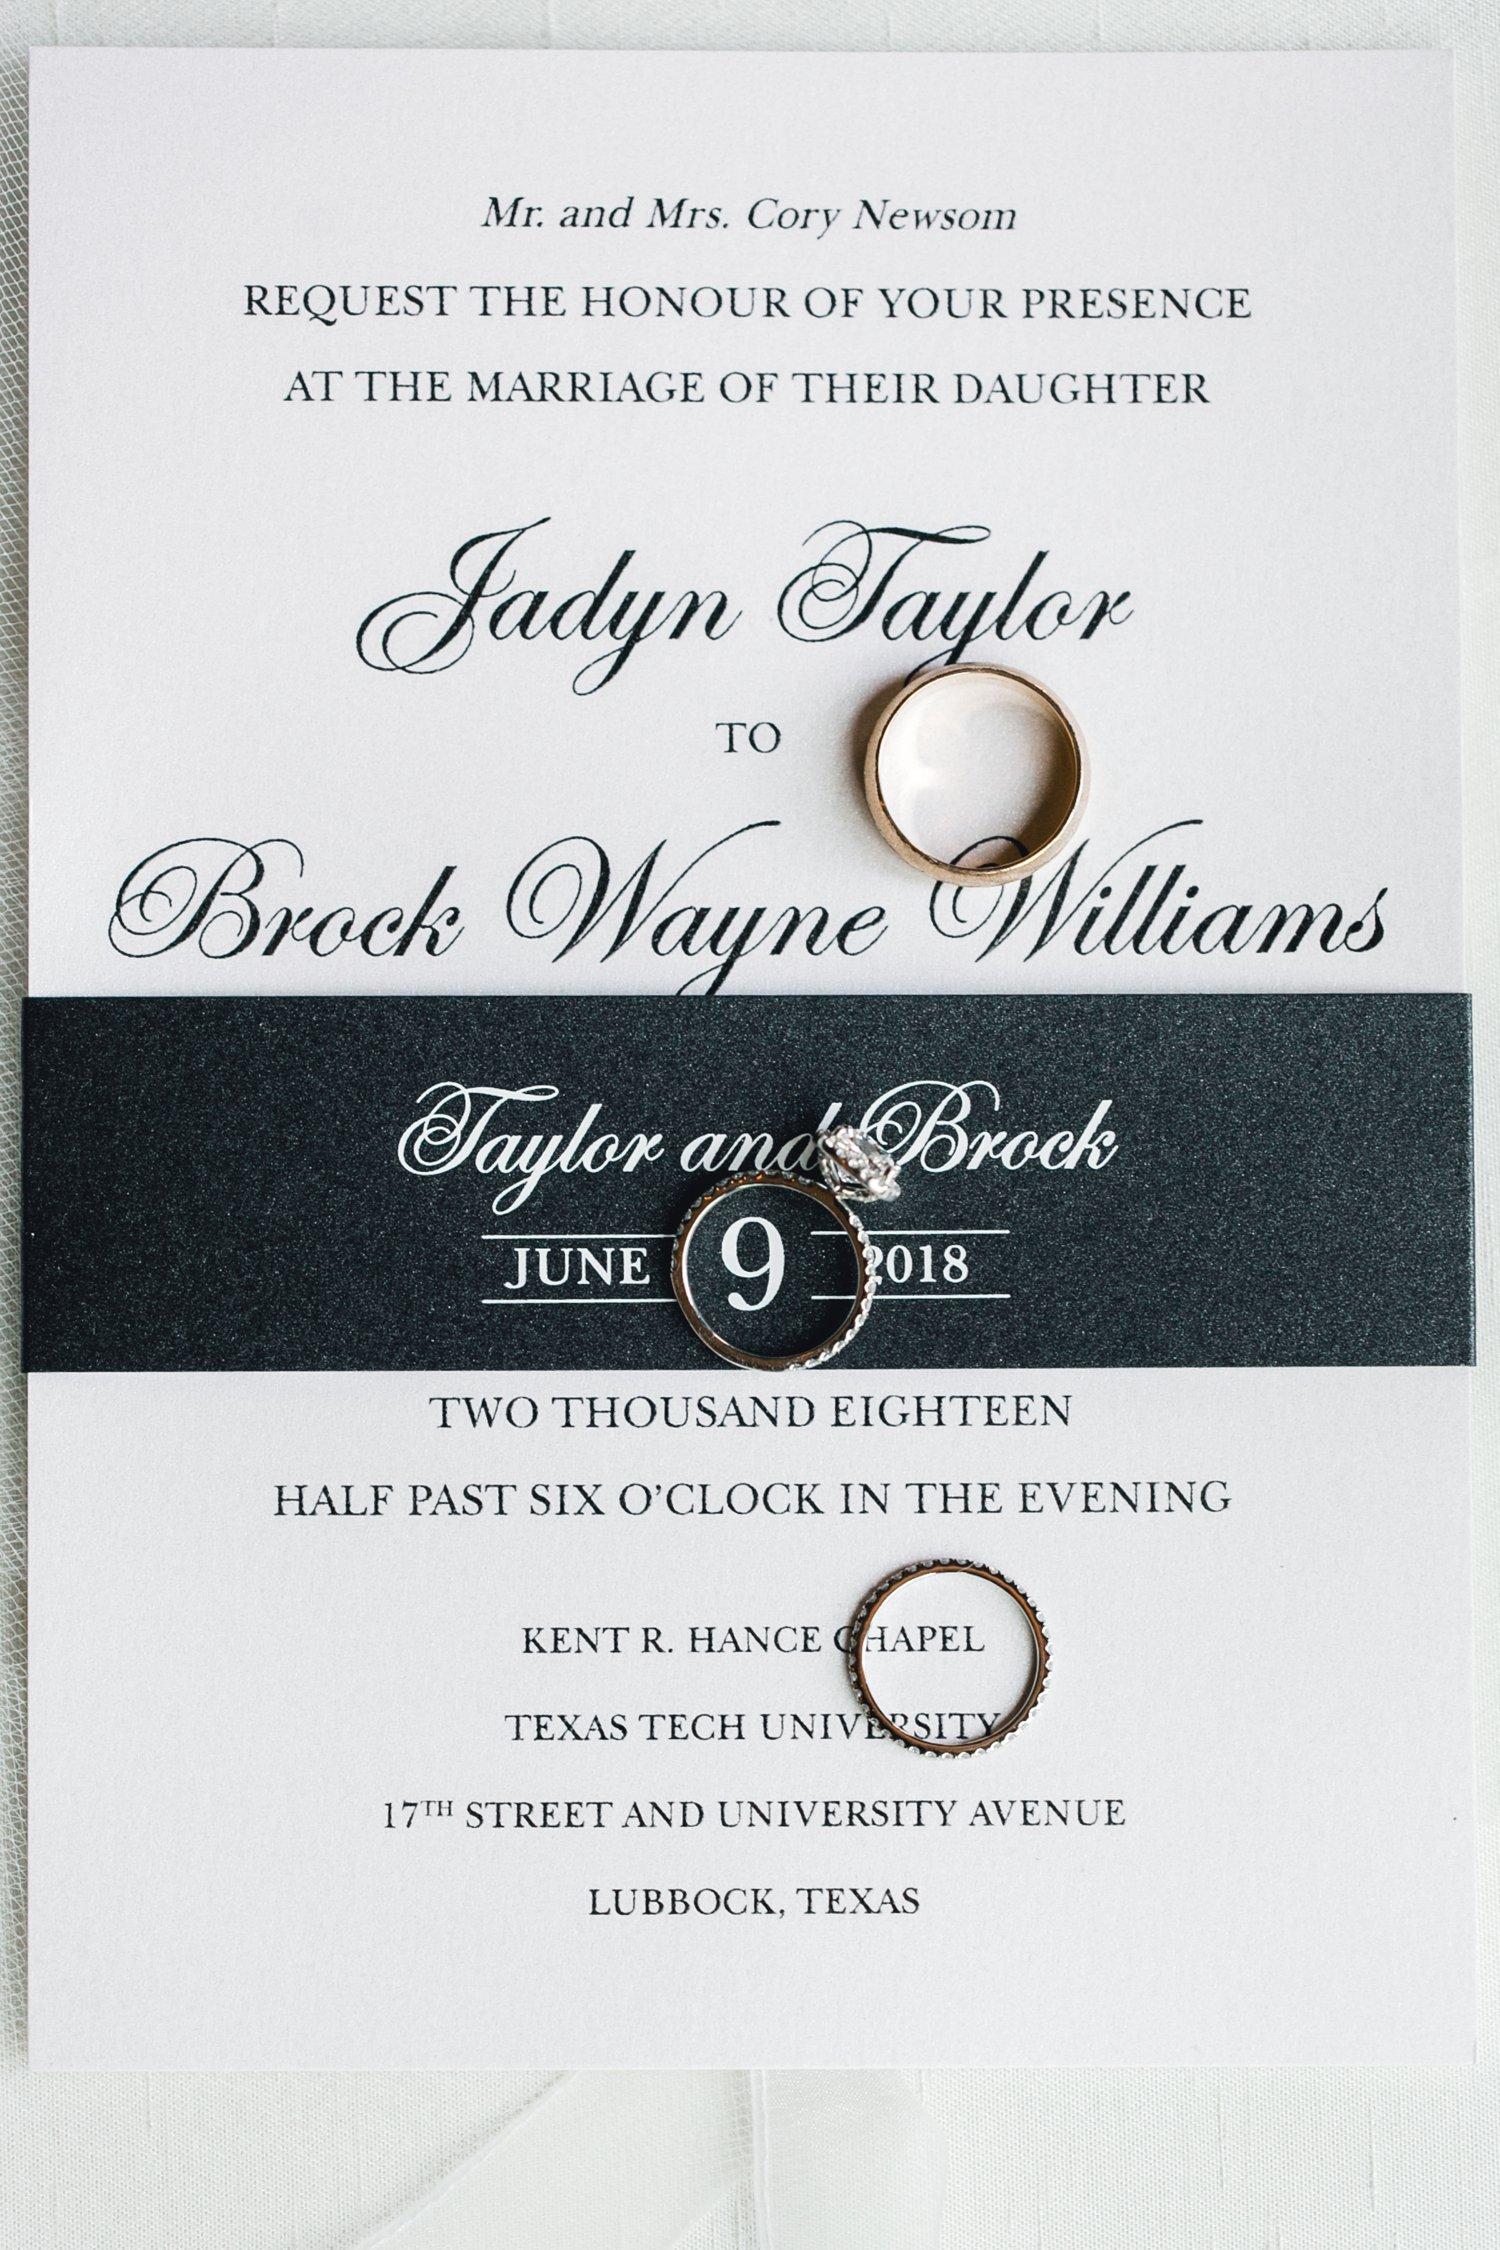 Taylor-and-Brock-Williams-Texas-Tech-University-Merket-Alumni-Center-Lubbock-Photographer-ALLEEJ0024.jpg